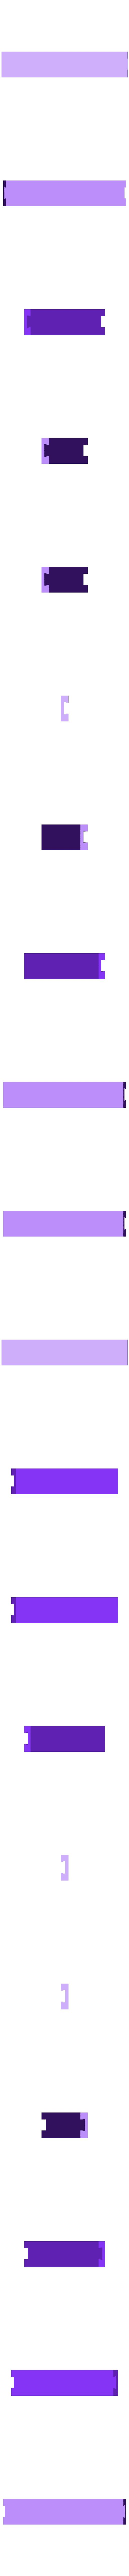 handle v2.stl Download STL file Disney Abecedary Stamp LowerCase Letters • 3D printer model, davidruizo